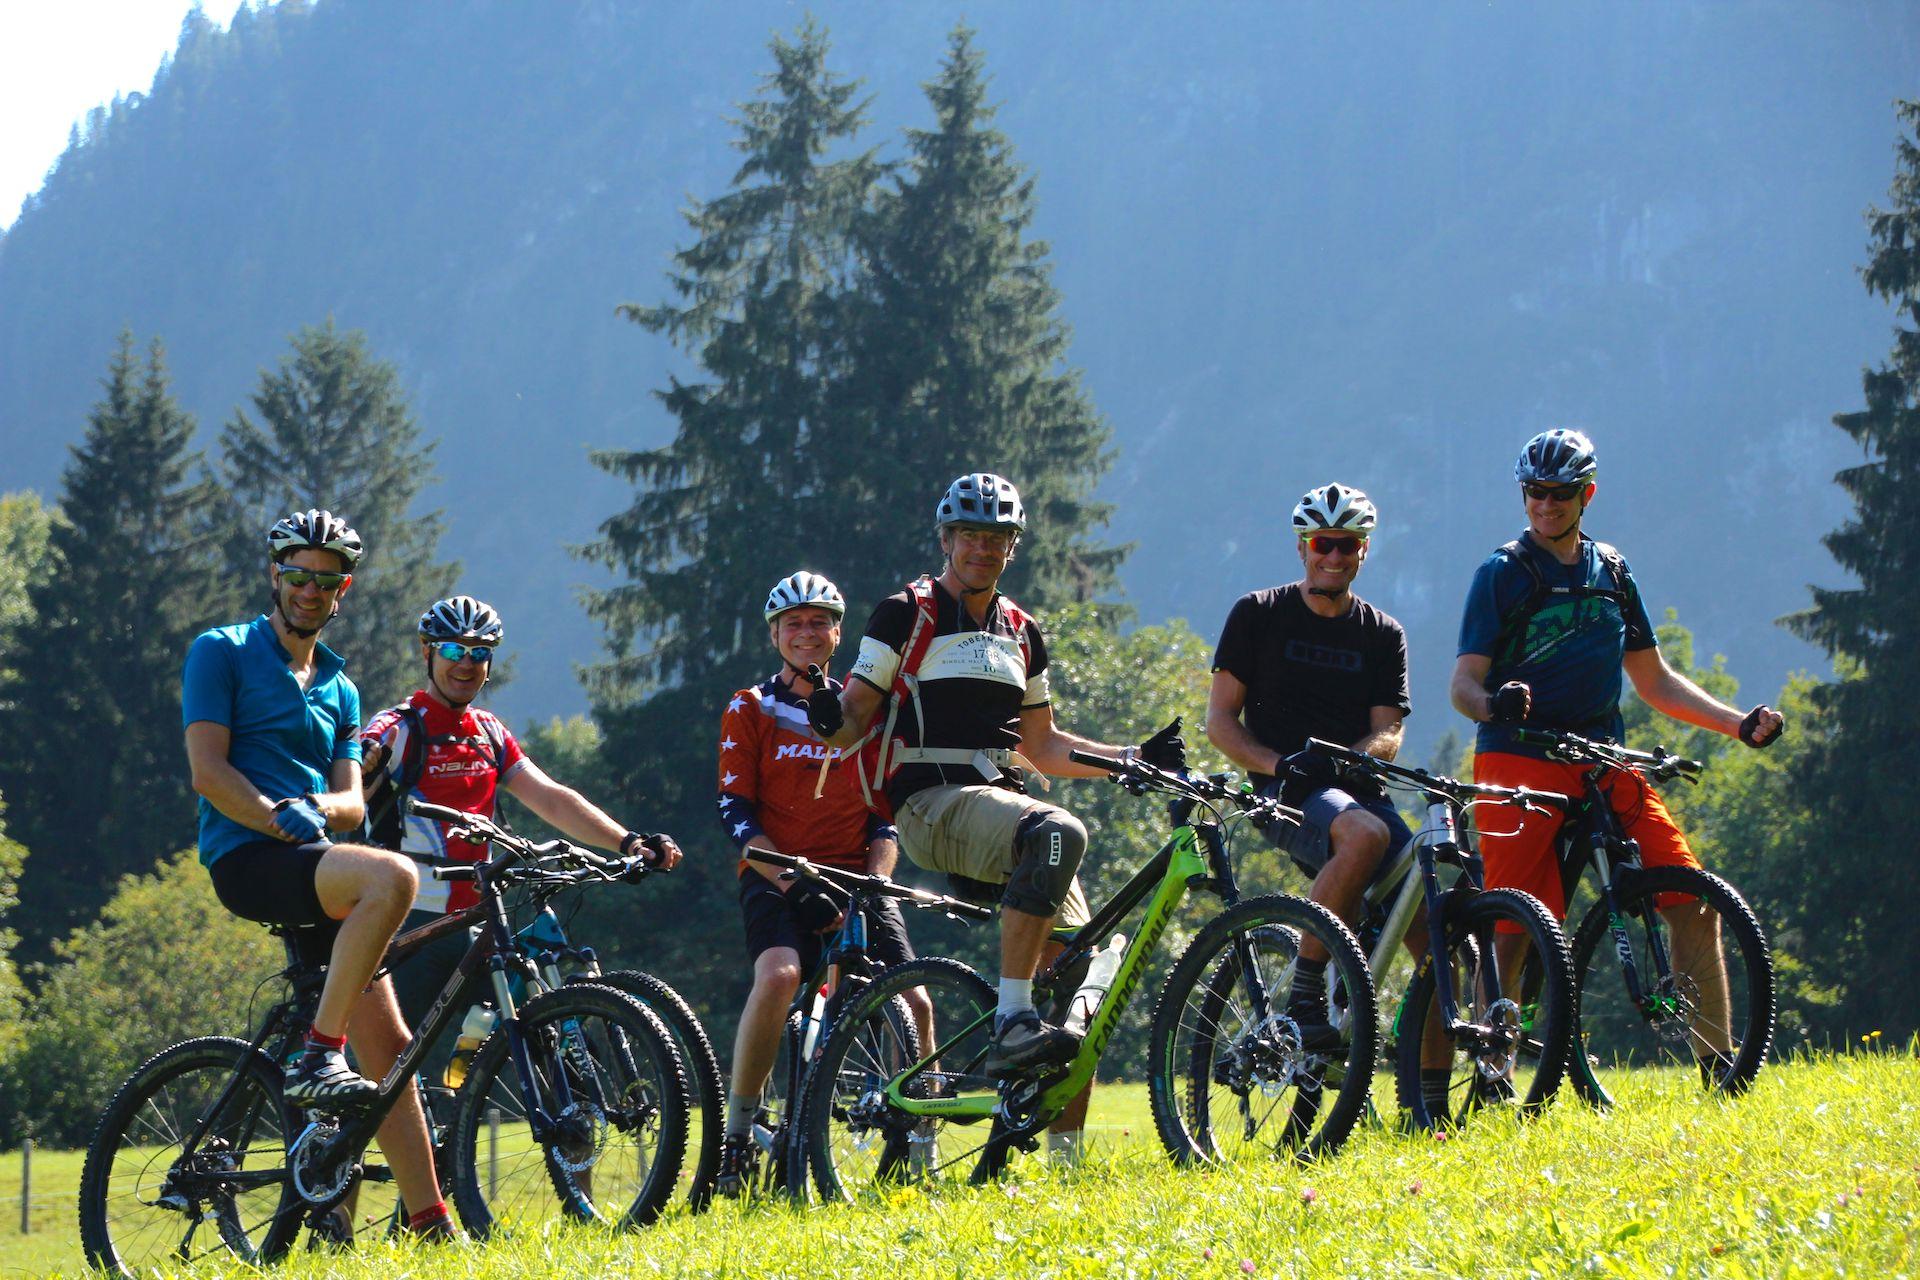 MTB Fahrtechnik Kurse im Bikepark Samerberg Anfänger Beginner und Fortgeschritten Training - Rock my Trail Bikeschule -1